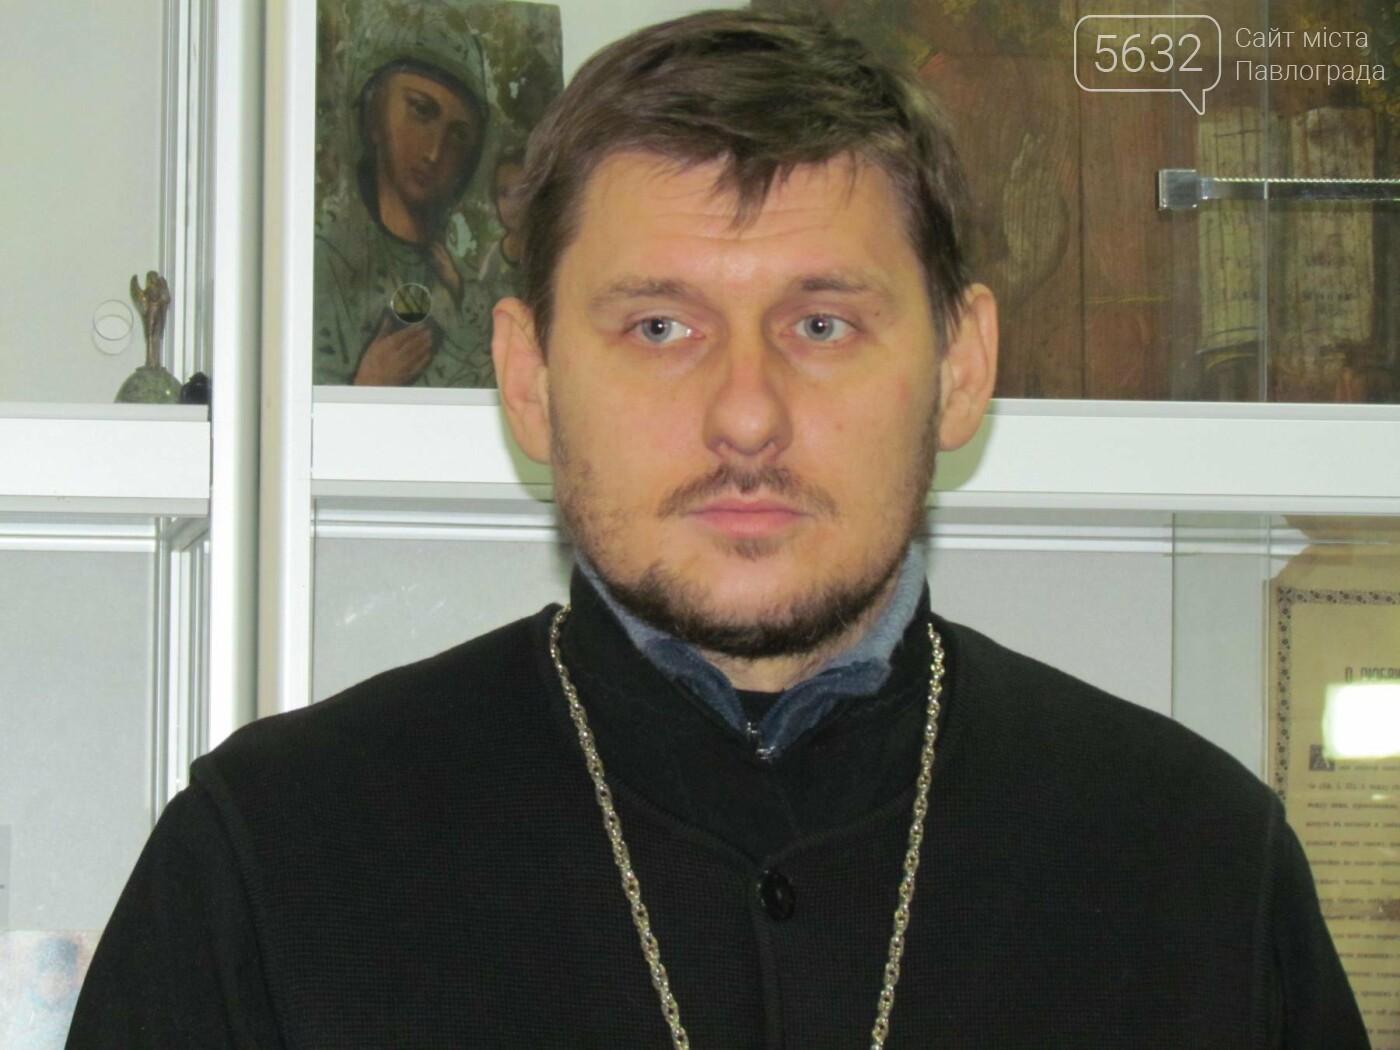 В Павлограде представили нового благочинного церковного округа, фото-2